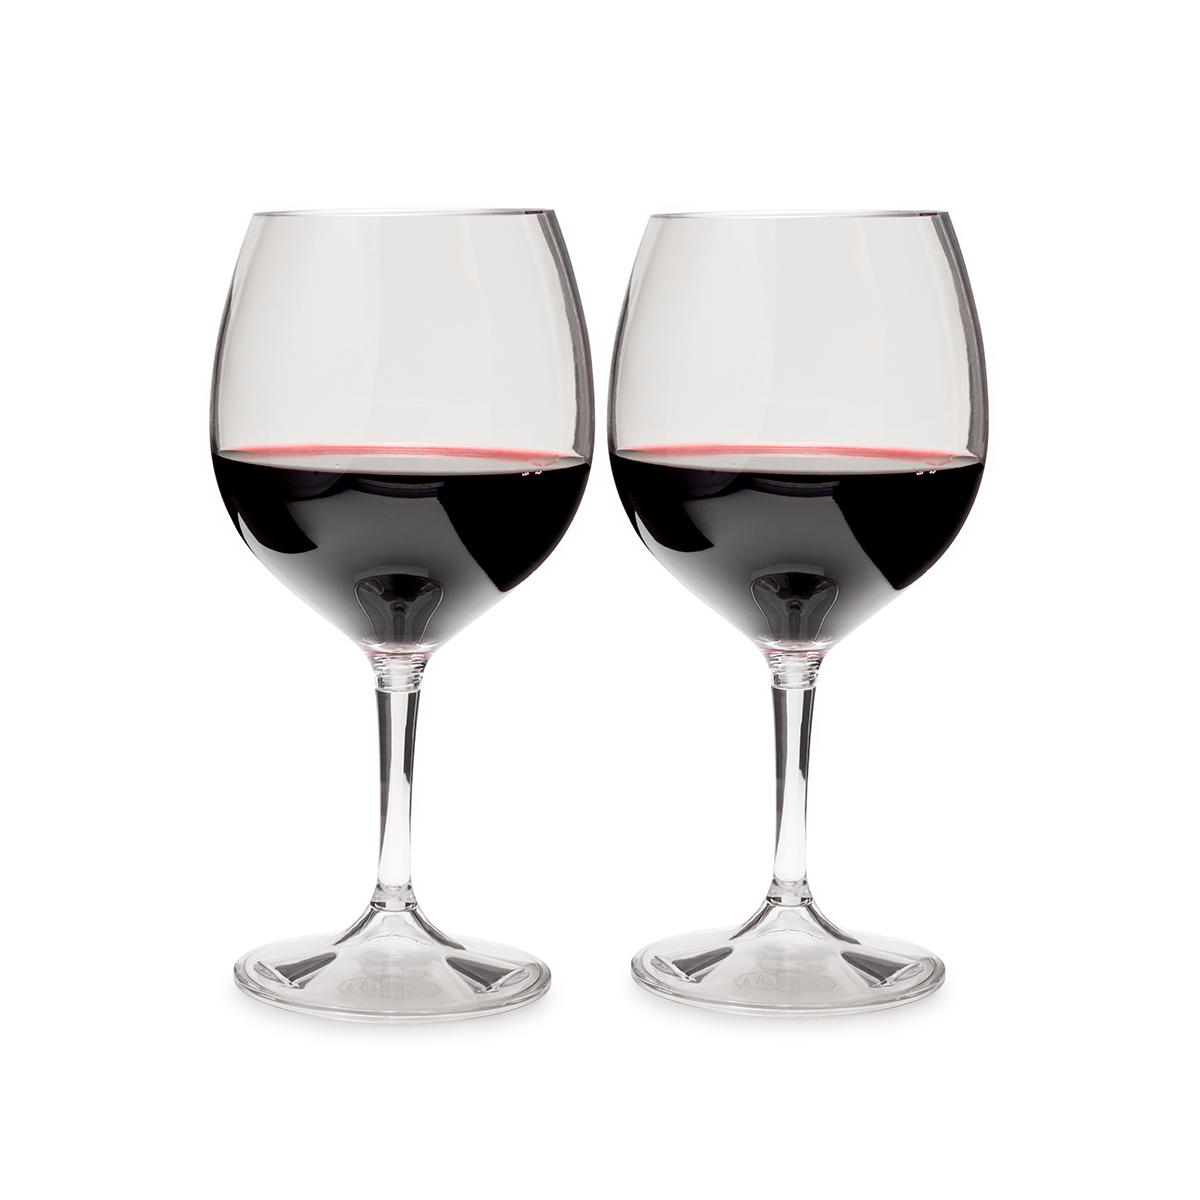 AIRMKT eCom PN XXXXXX GSI Red Wine 1 WEB